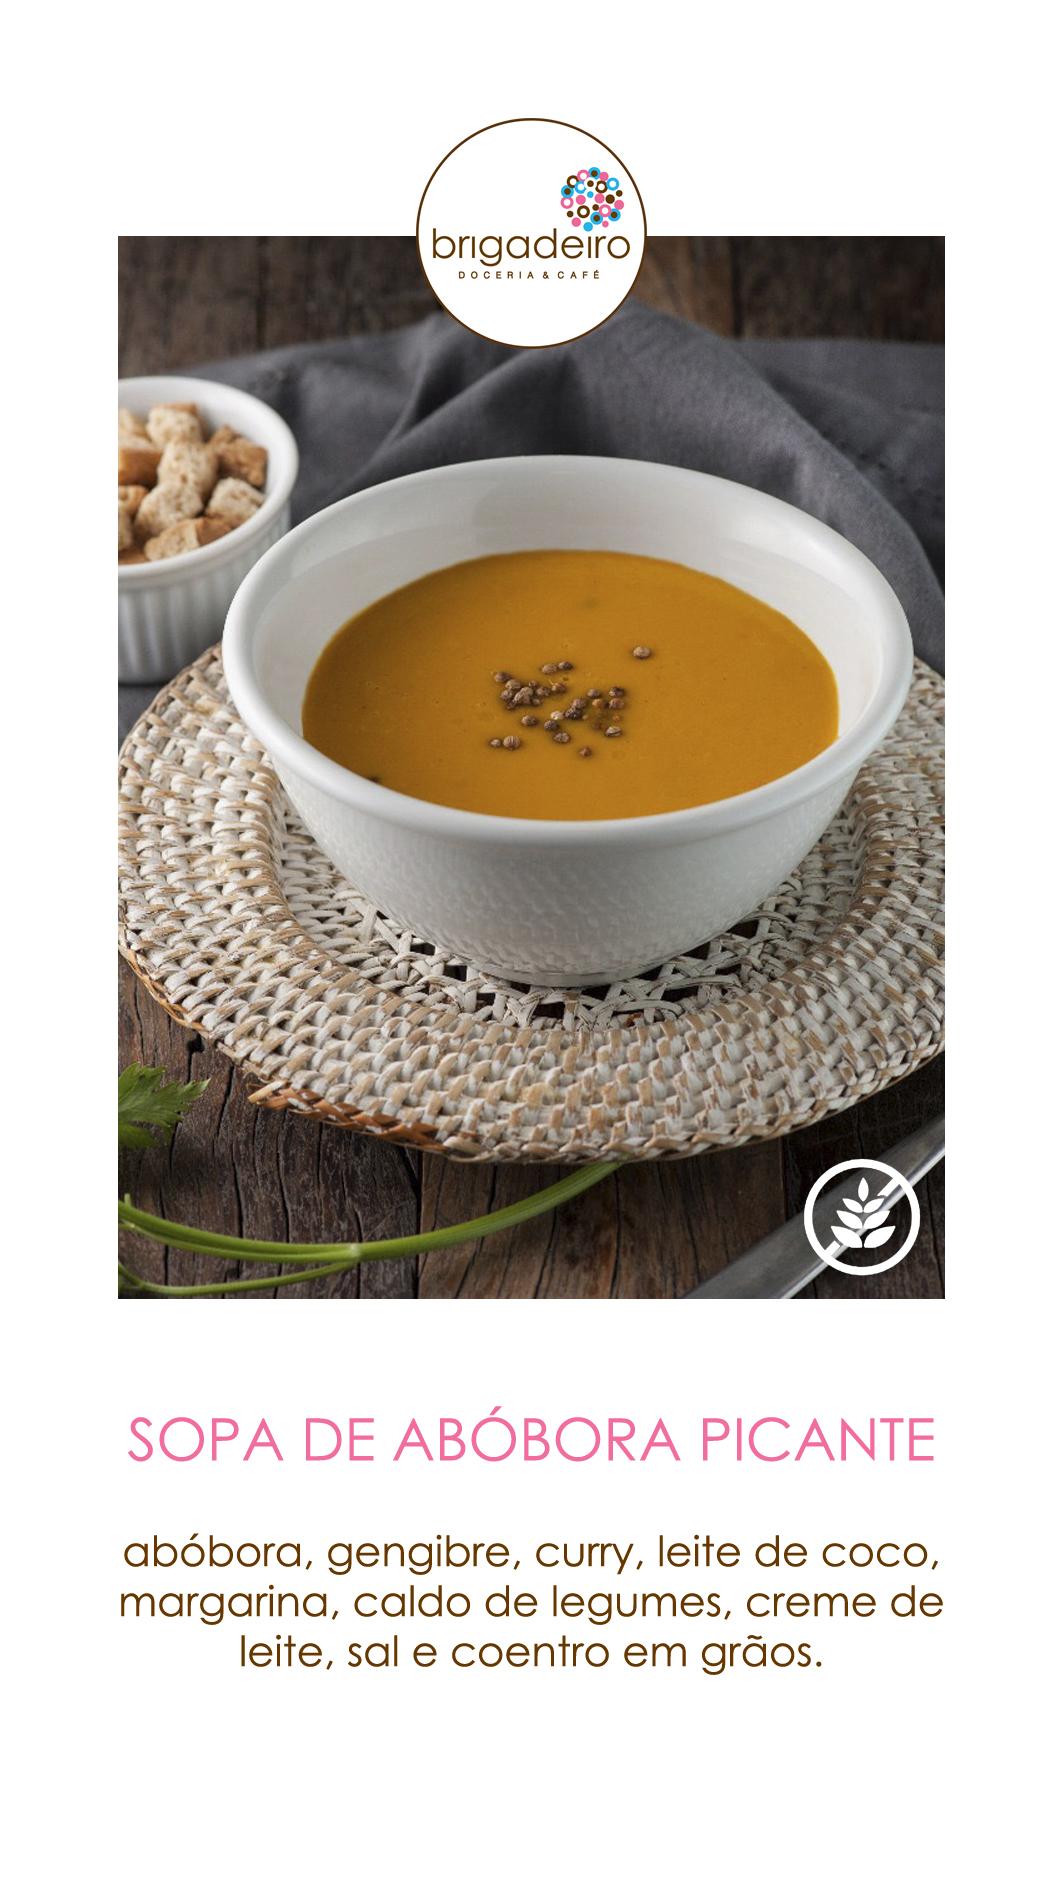 SOPA_DE_ABÓBORA_PICANTE